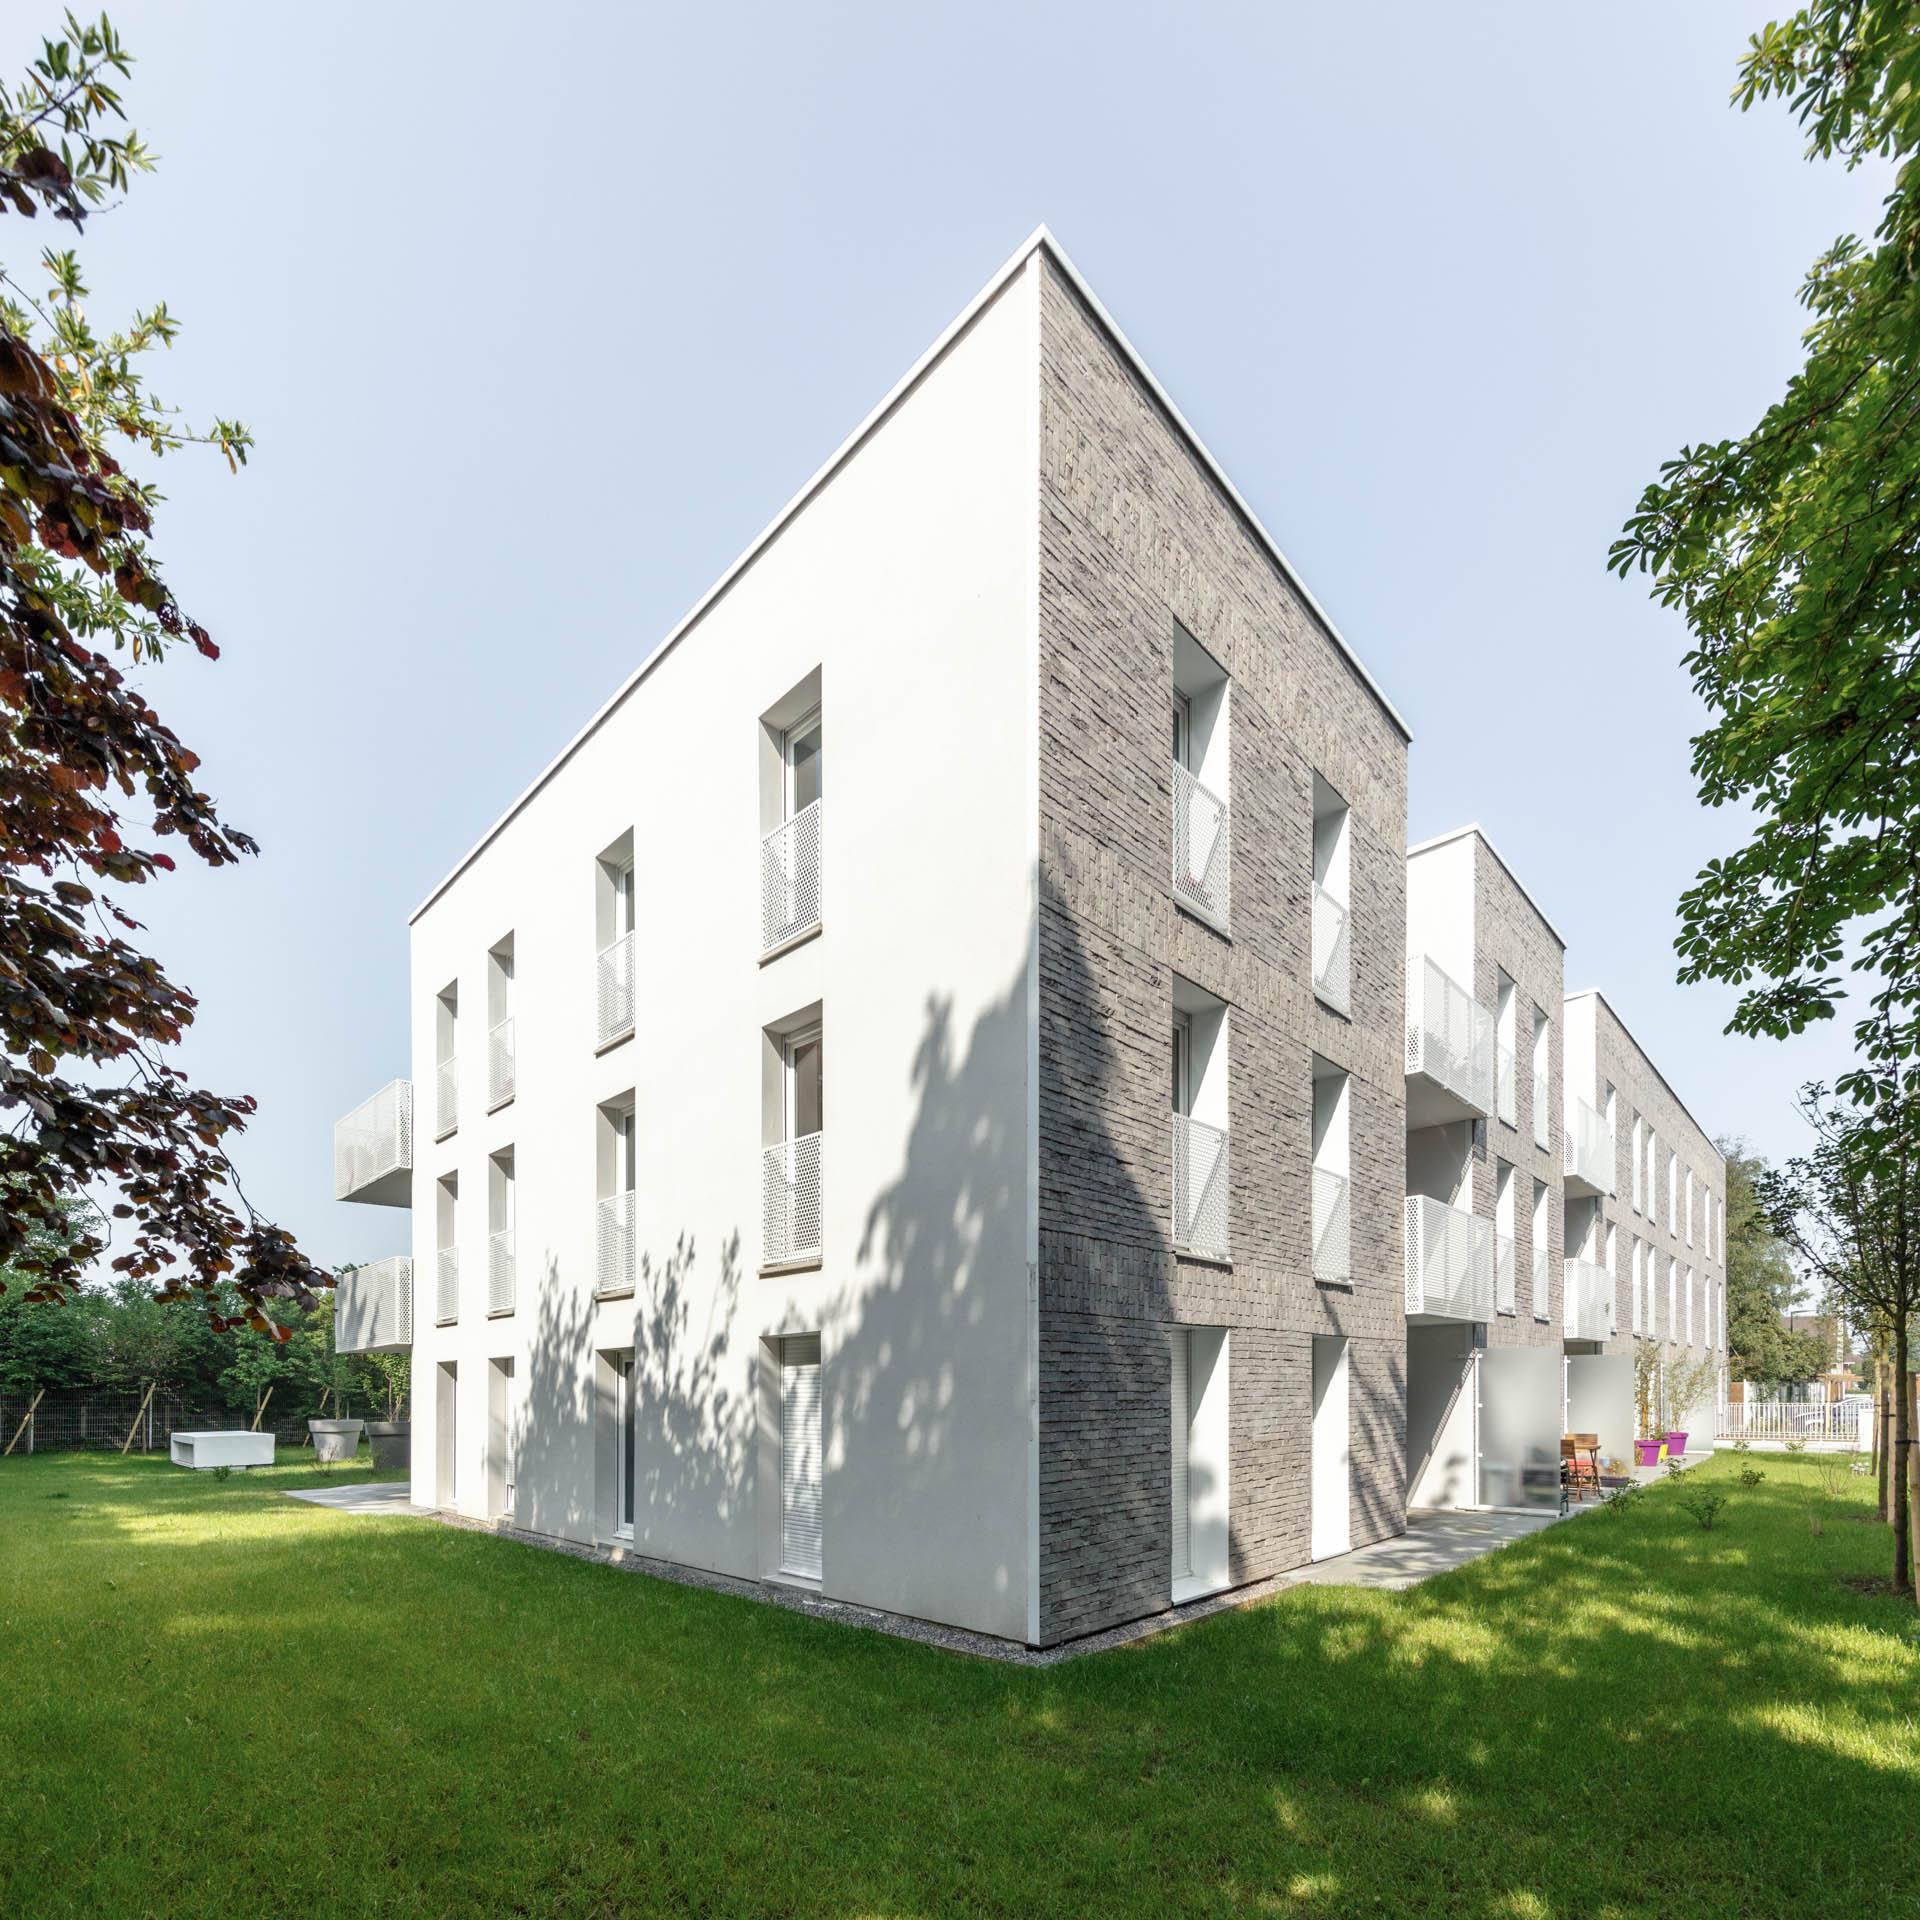 LDKphoto - Rue Henri Barbuse - Fache Thumesnil - 13.jpg